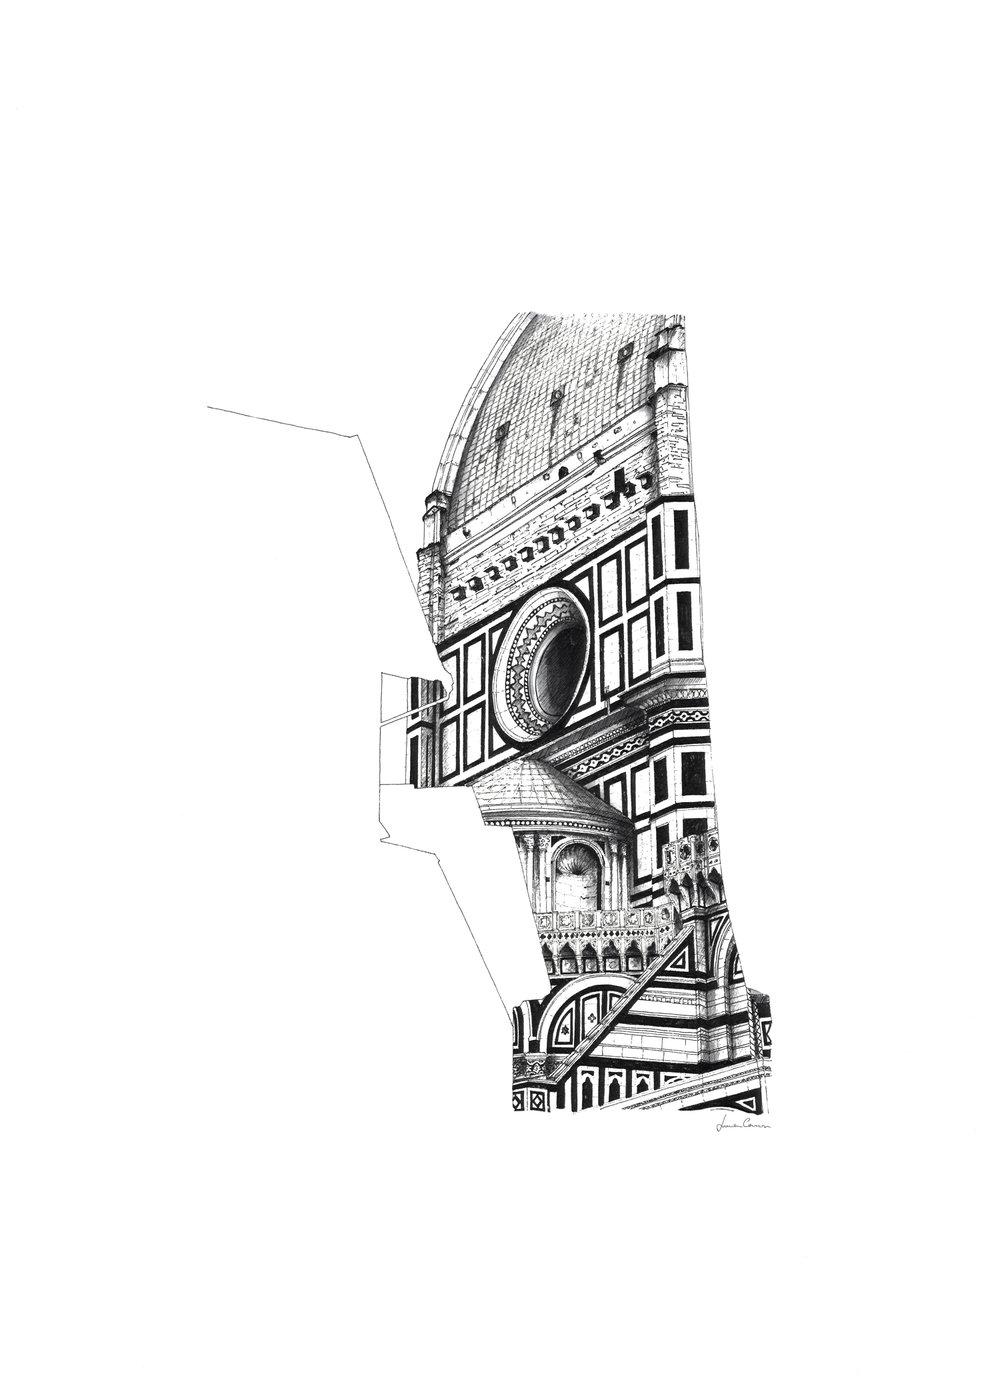 Cattedrale di Santa Maria del Fiore 01 - Firenze